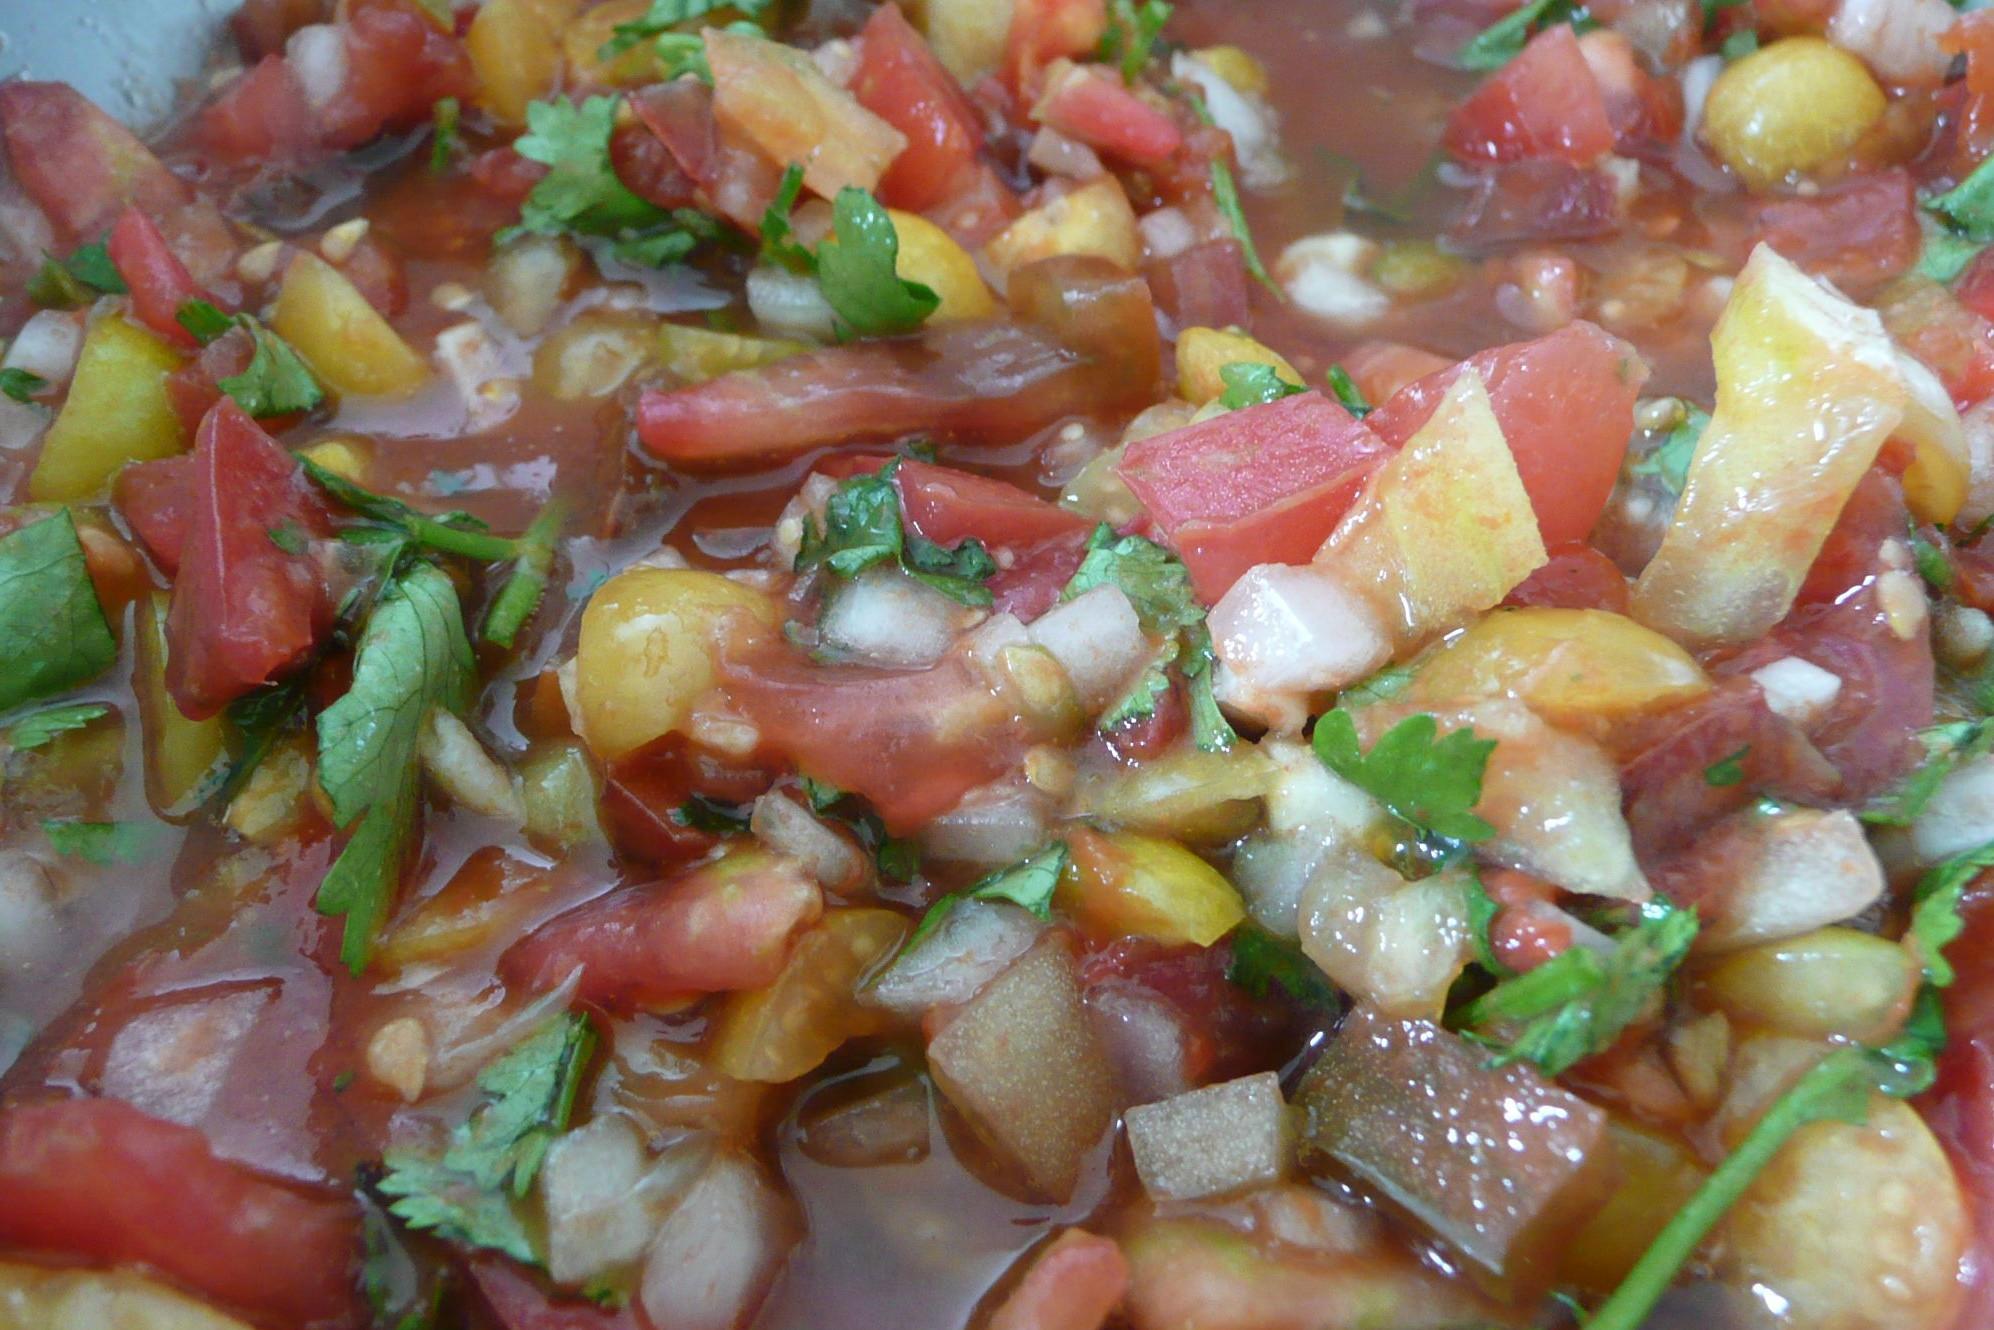 La recette facile de salsa de cerises de terre! Un délice...